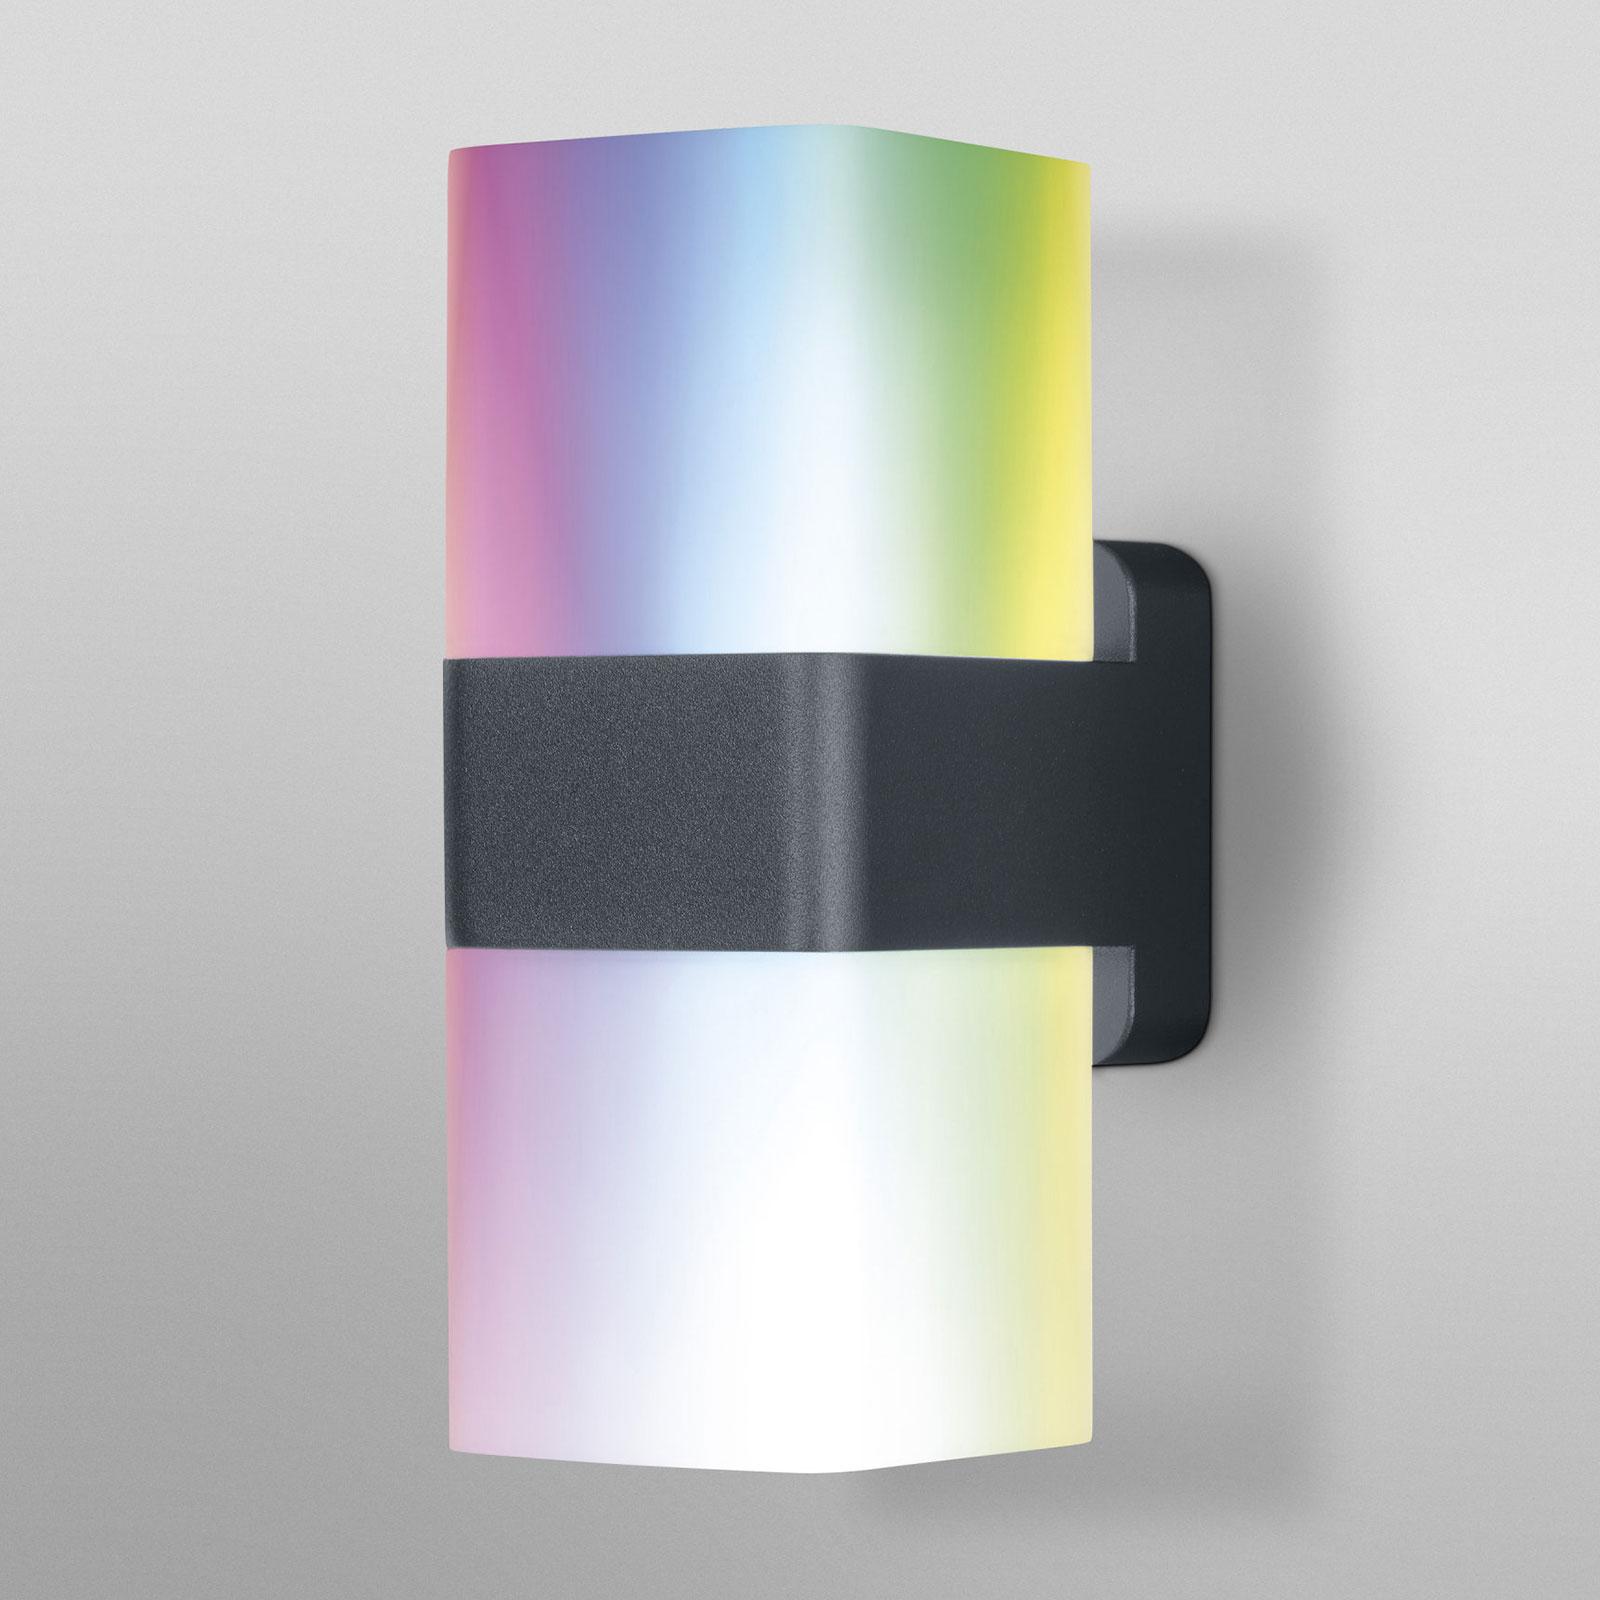 LEDVANCE SMART+ WiFi Cube væglampe RGBW up/down